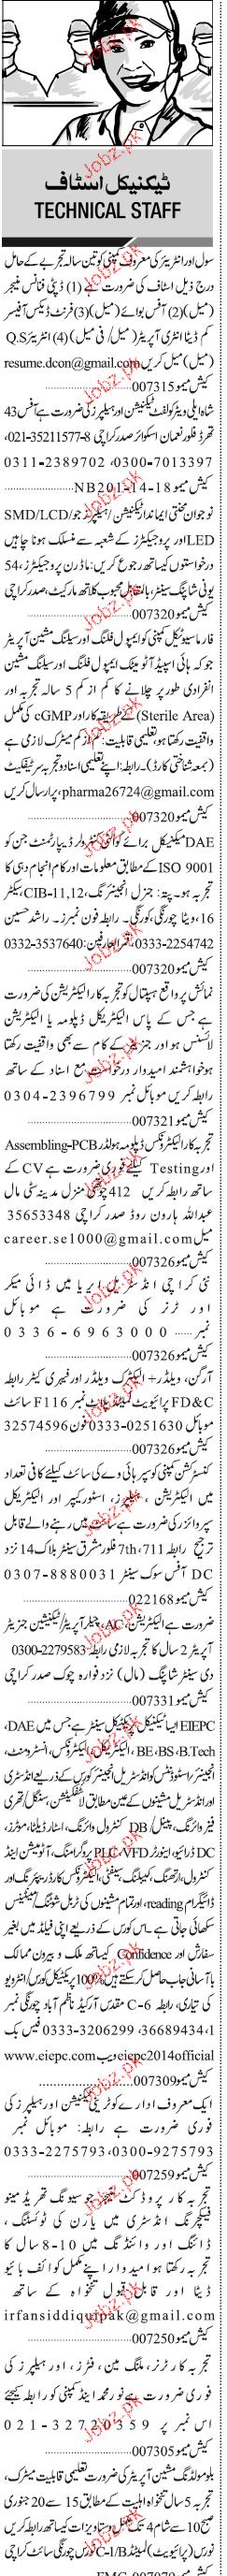 Deputy Finance Managers, Office Boys Job Opportunity